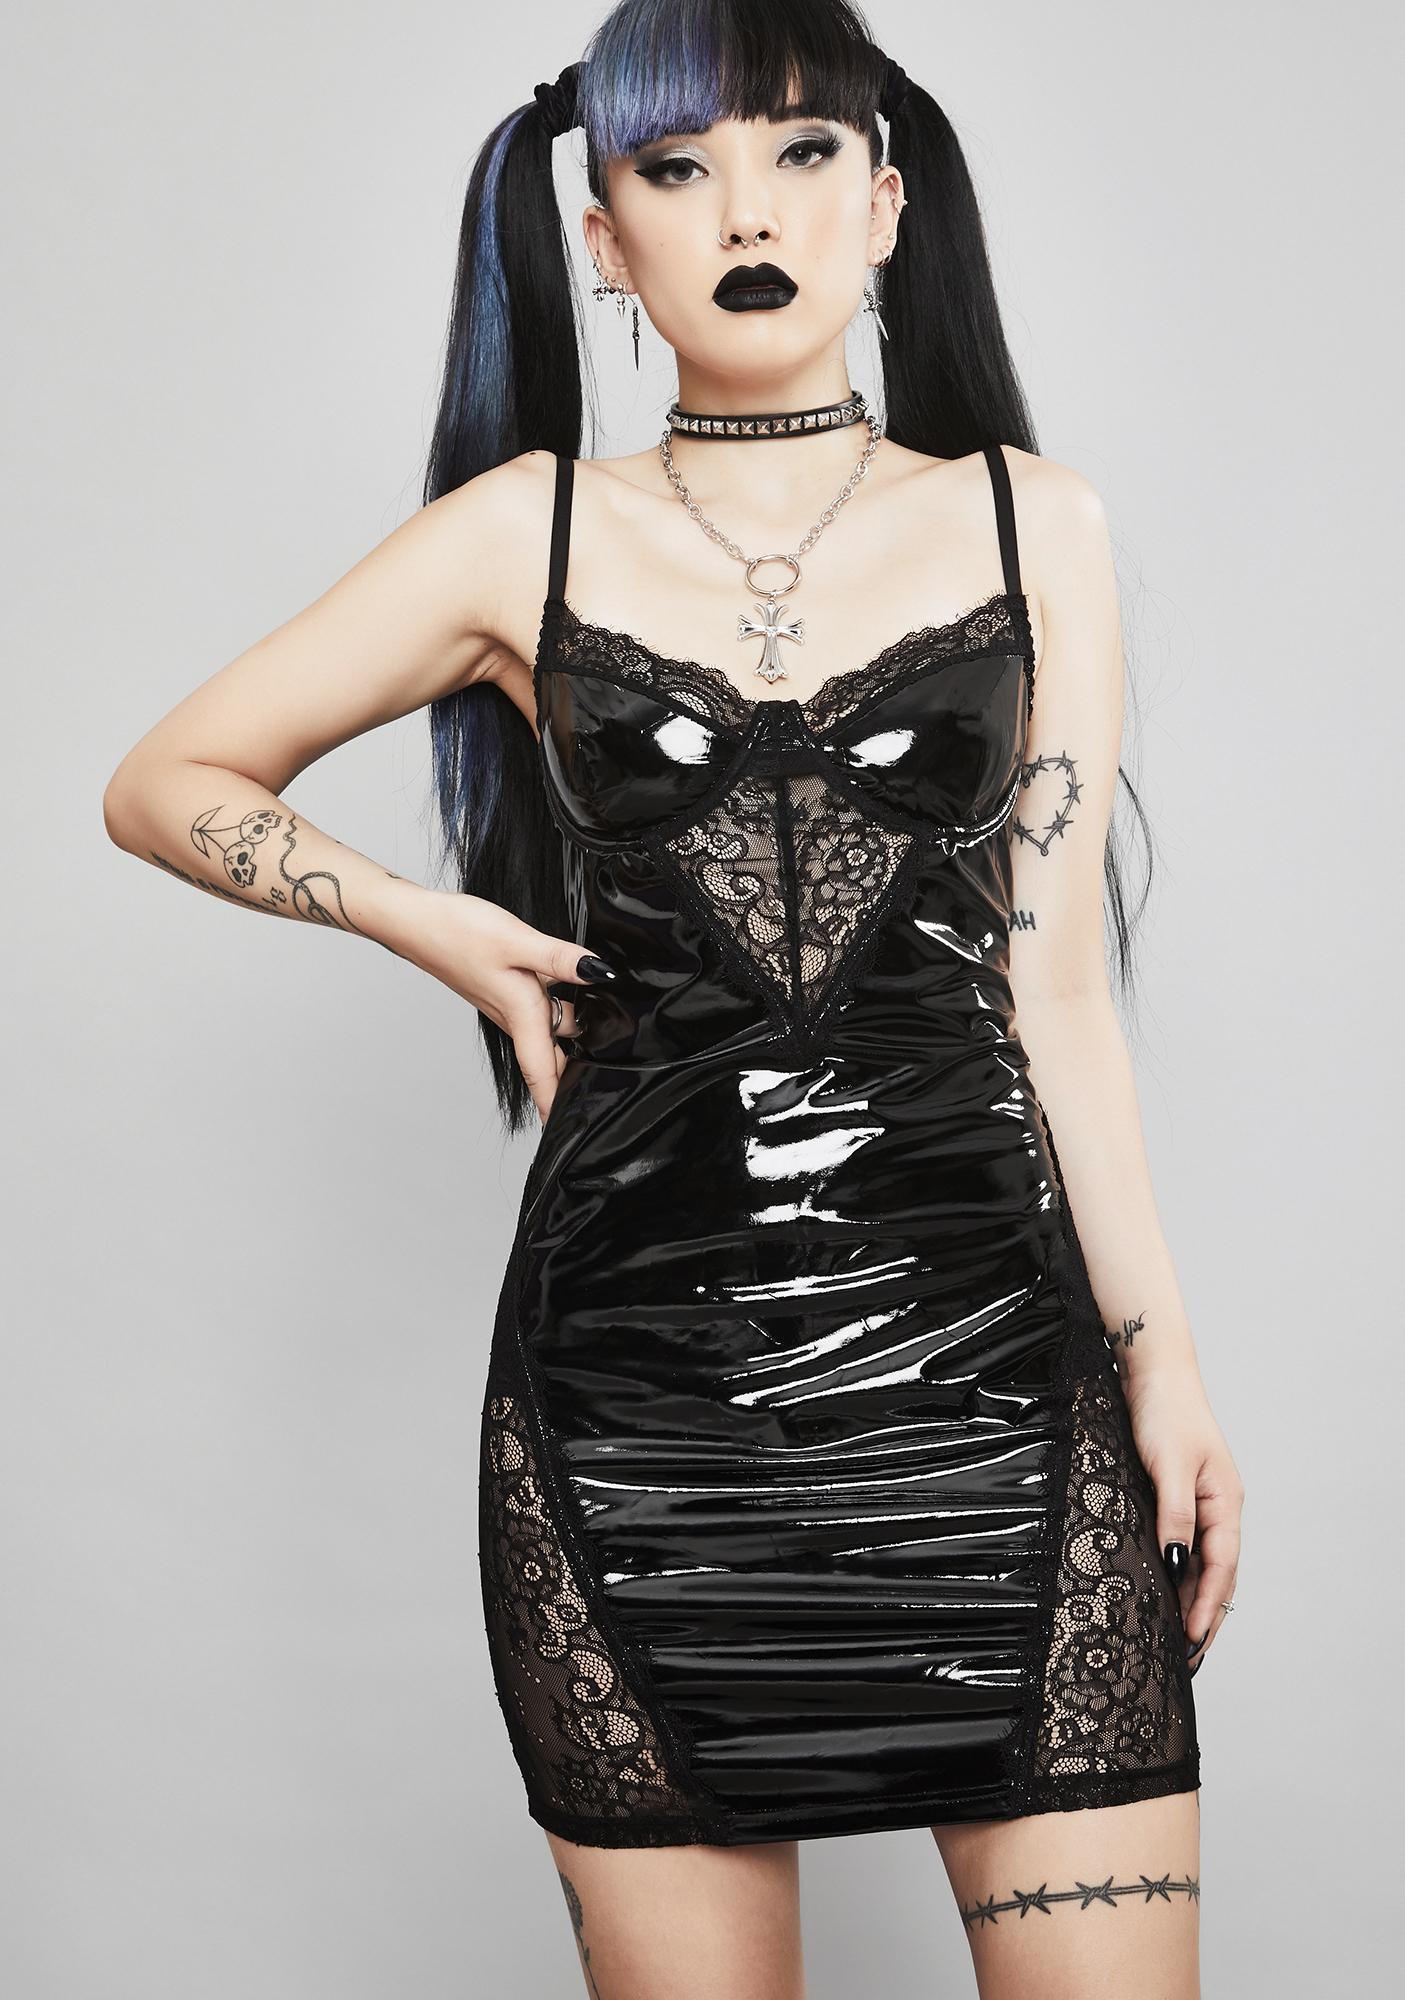 Widow Twisted Desire Vinyl Dress